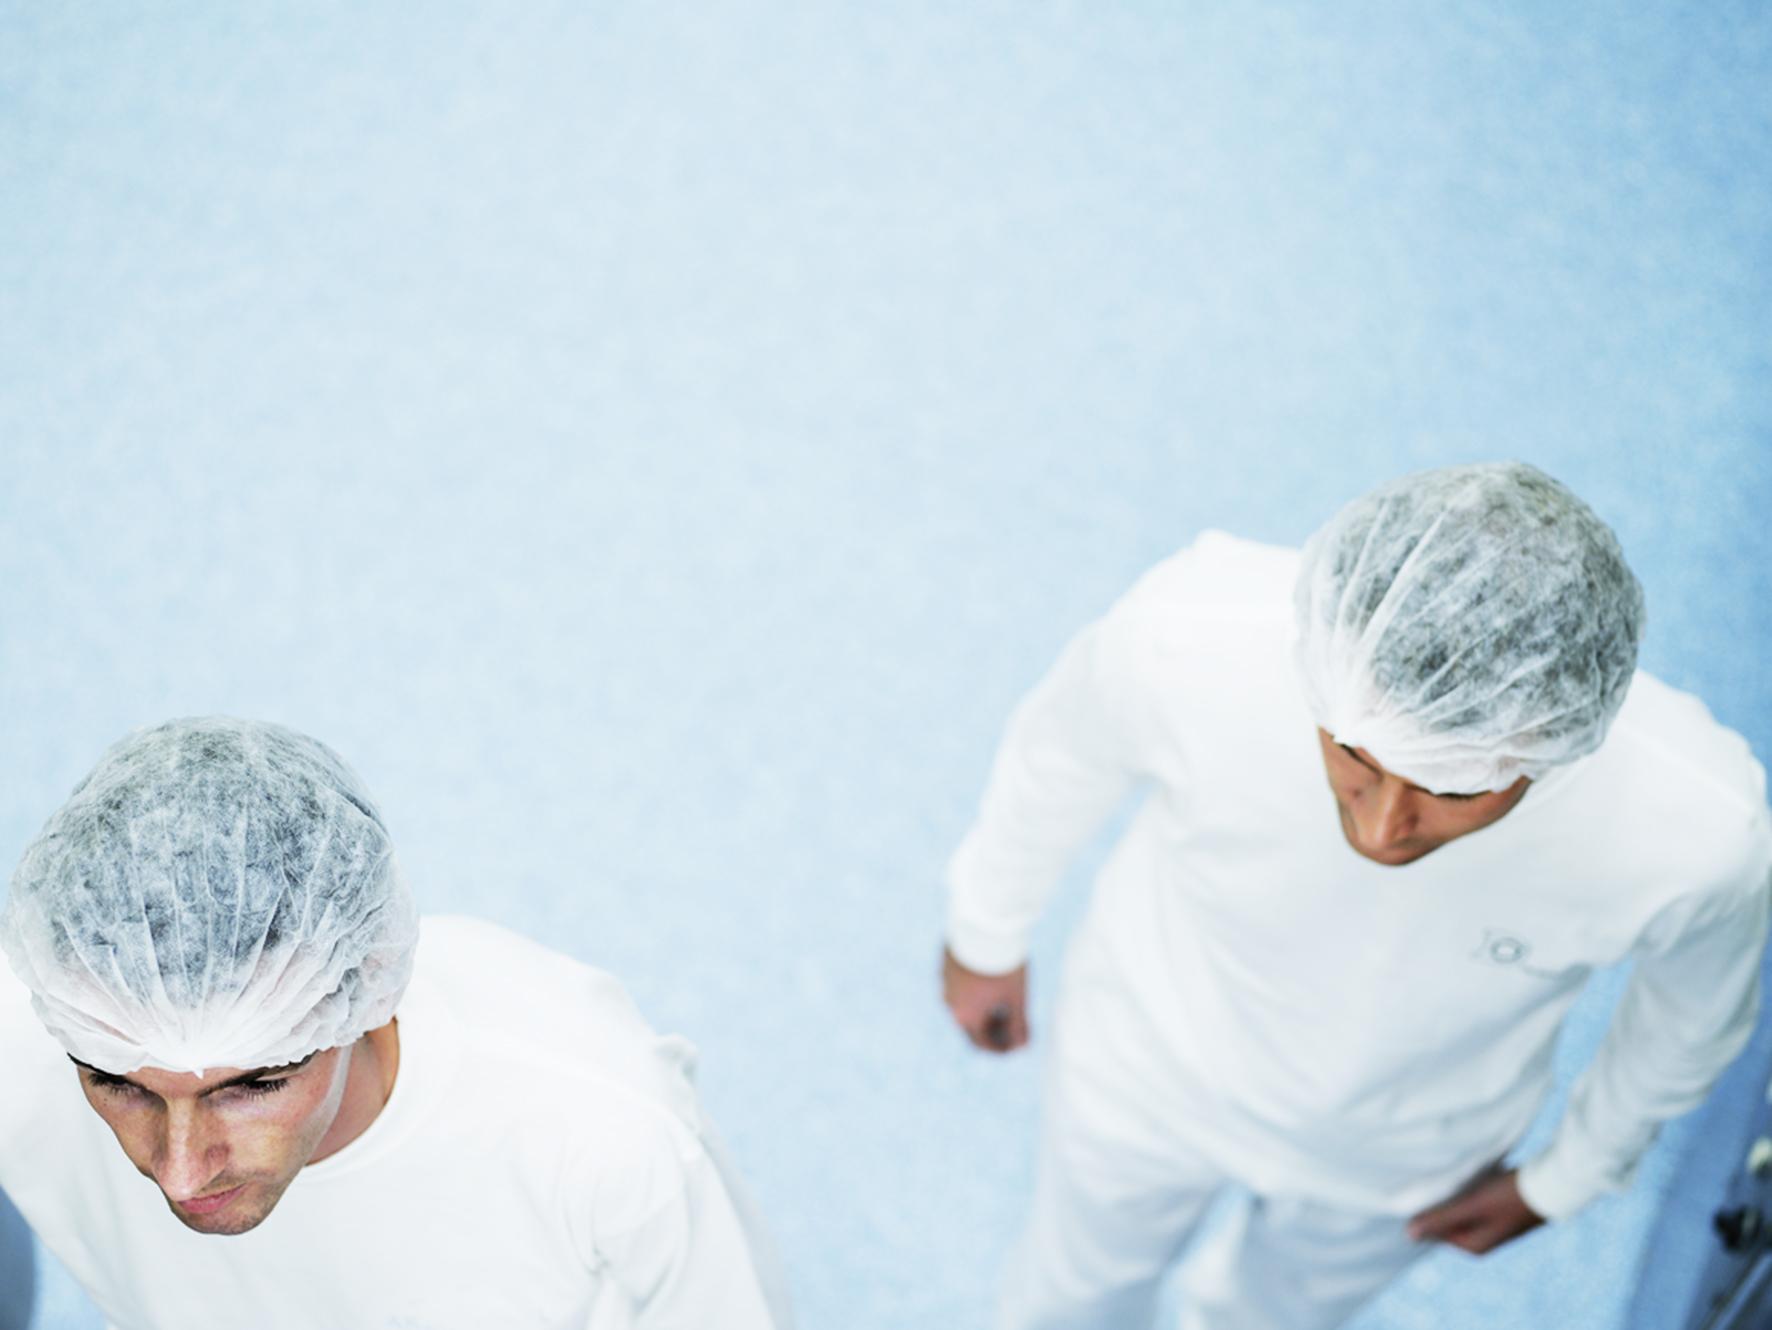 Organon, corporate images>2008